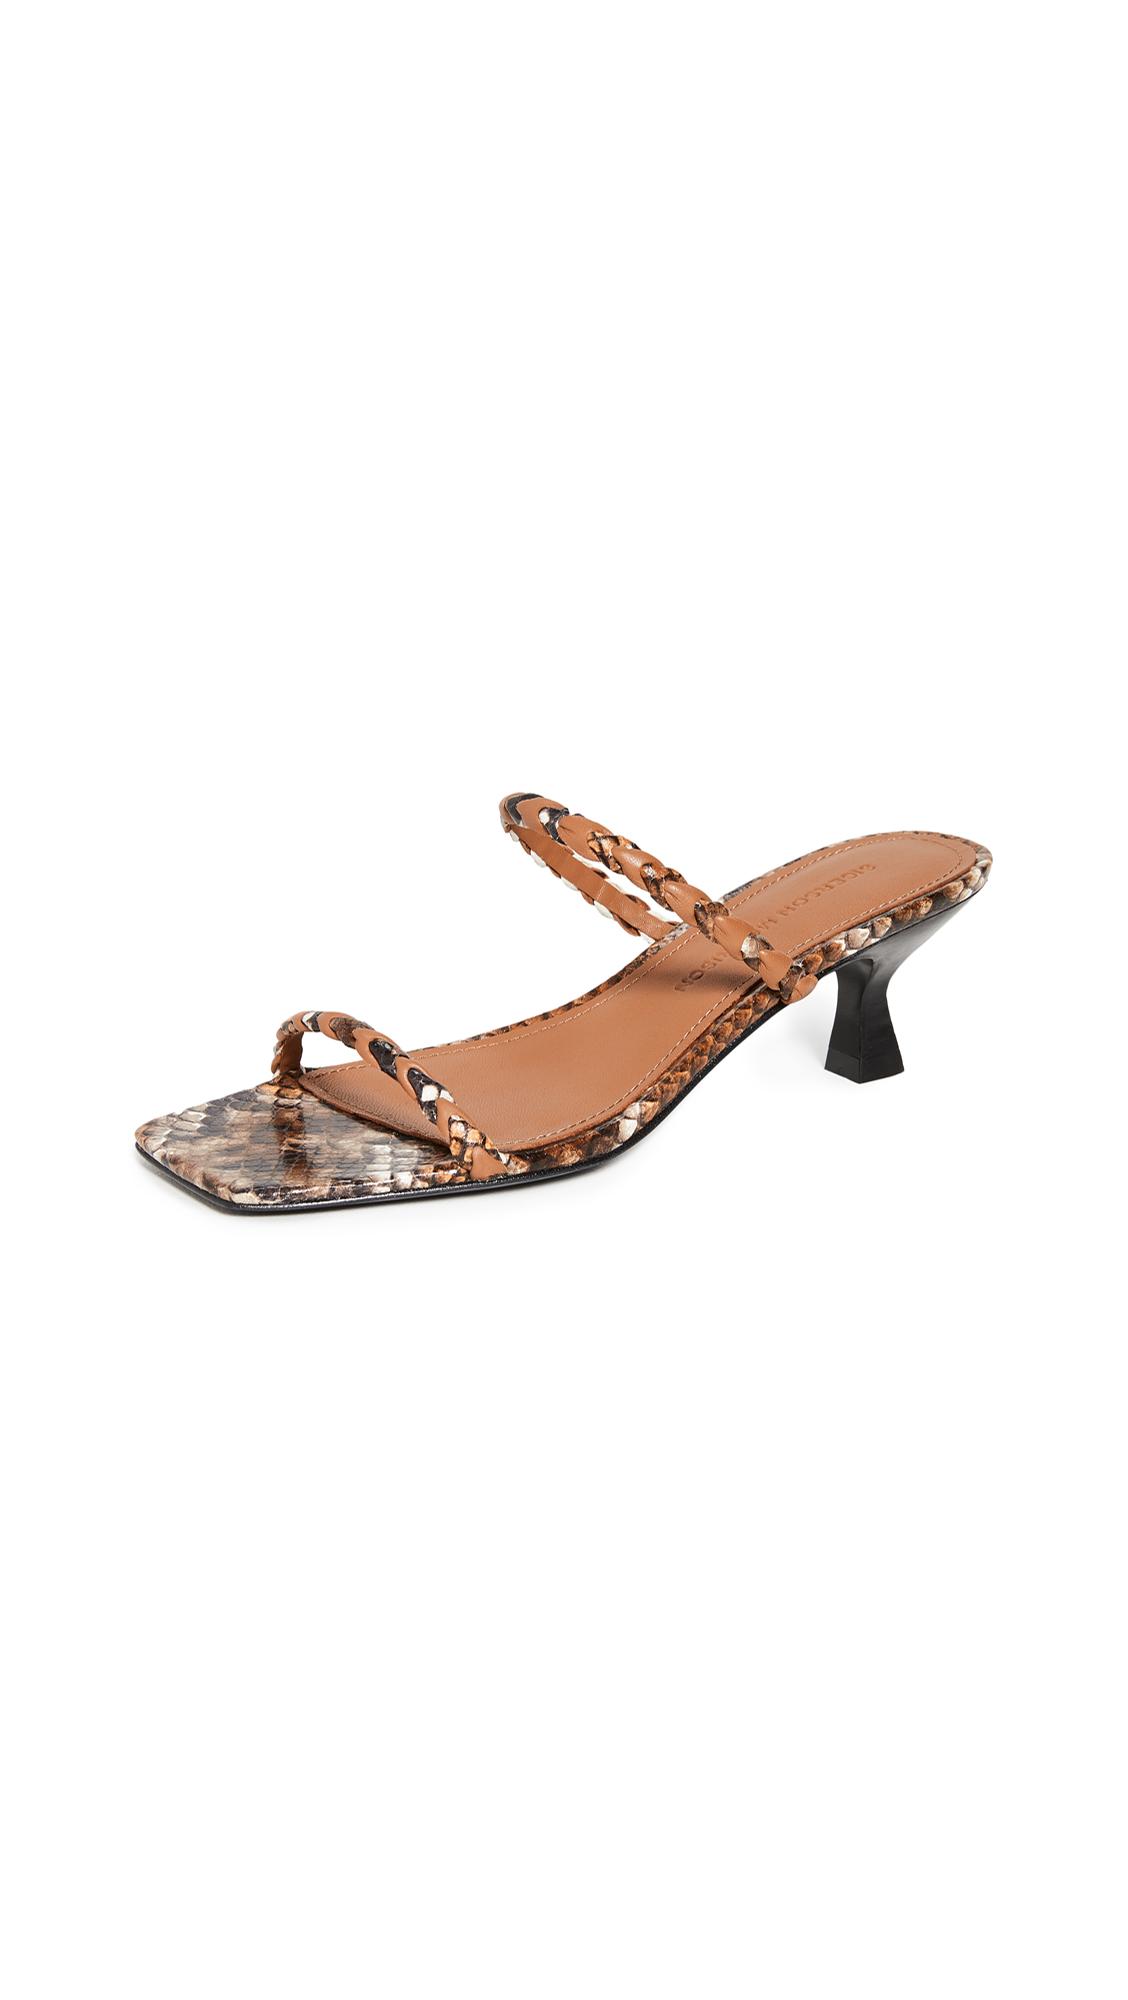 Buy Sigerson Morrison Abnel Sandals online, shop Sigerson Morrison